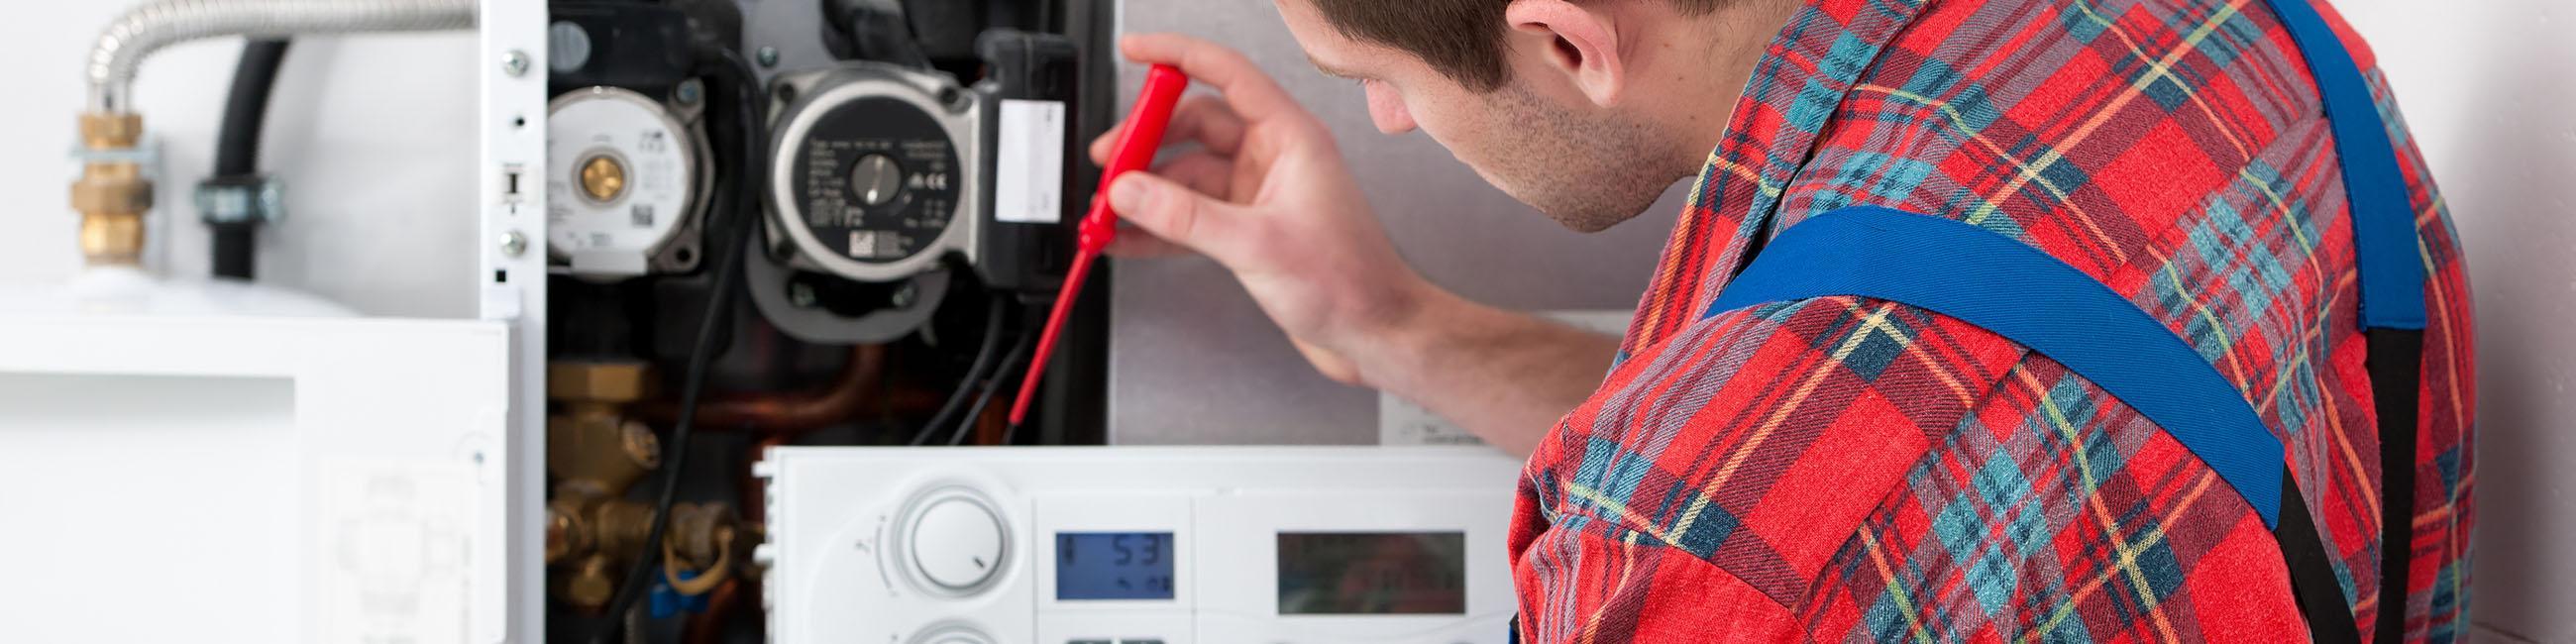 HVAC Service & Repair. Serving Orange County, CA. Air Conditioning & Heating